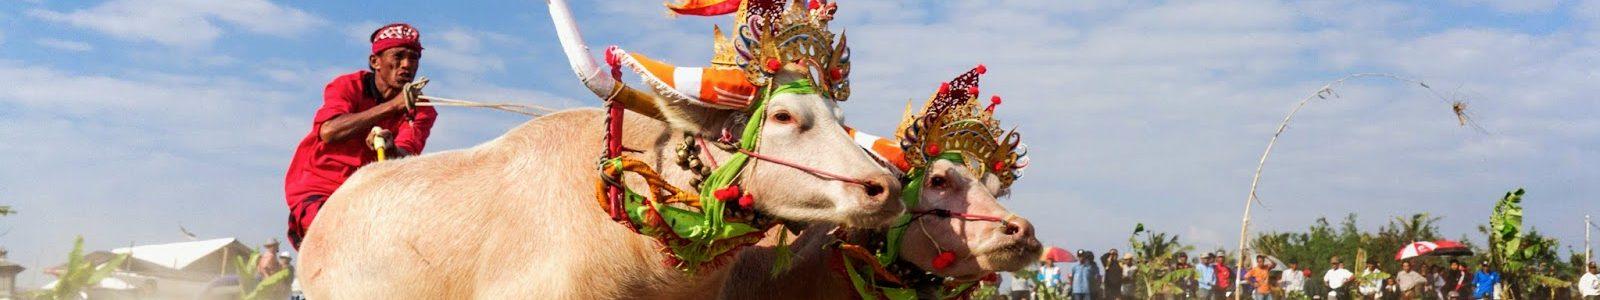 Makepung Buffalo Races: la corsa dei bufali di Bali